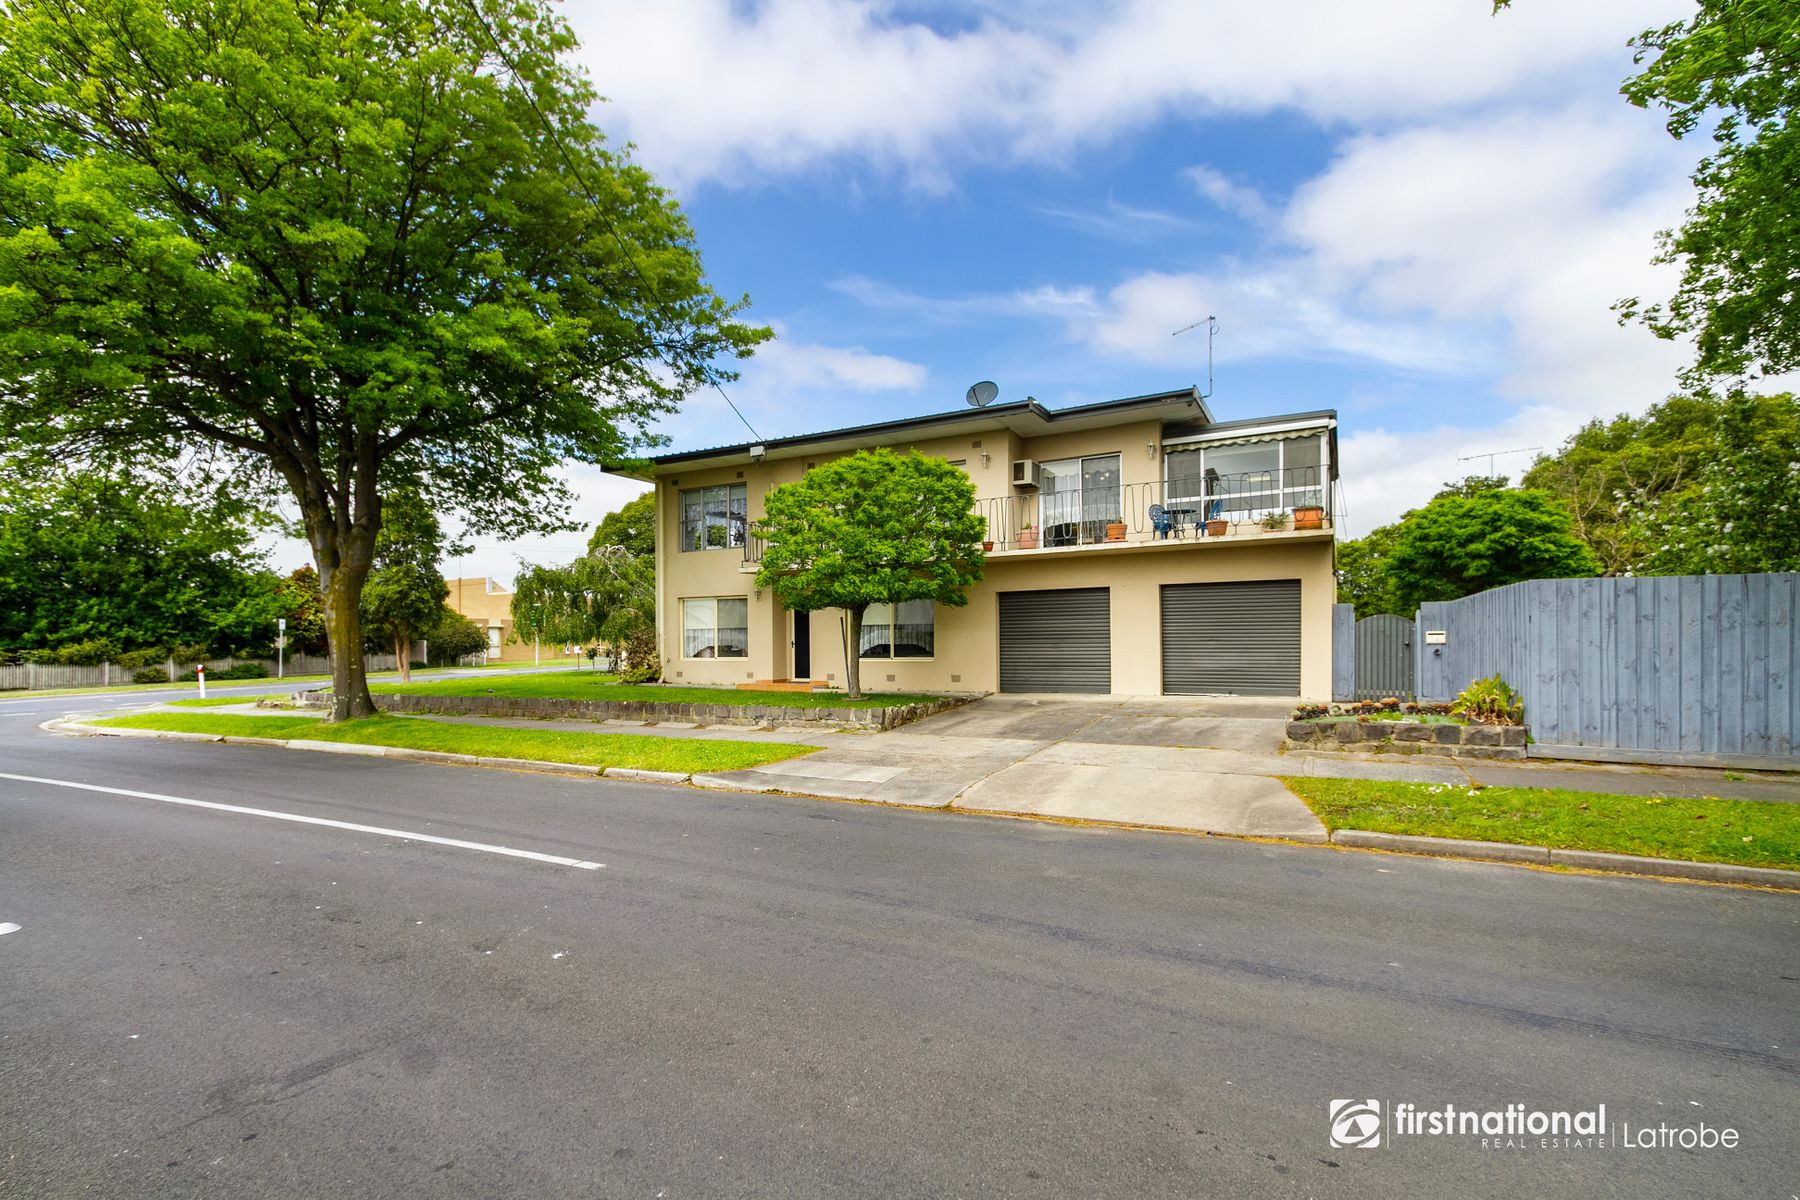 7A Latrobe Road, Morwell, VIC 3840